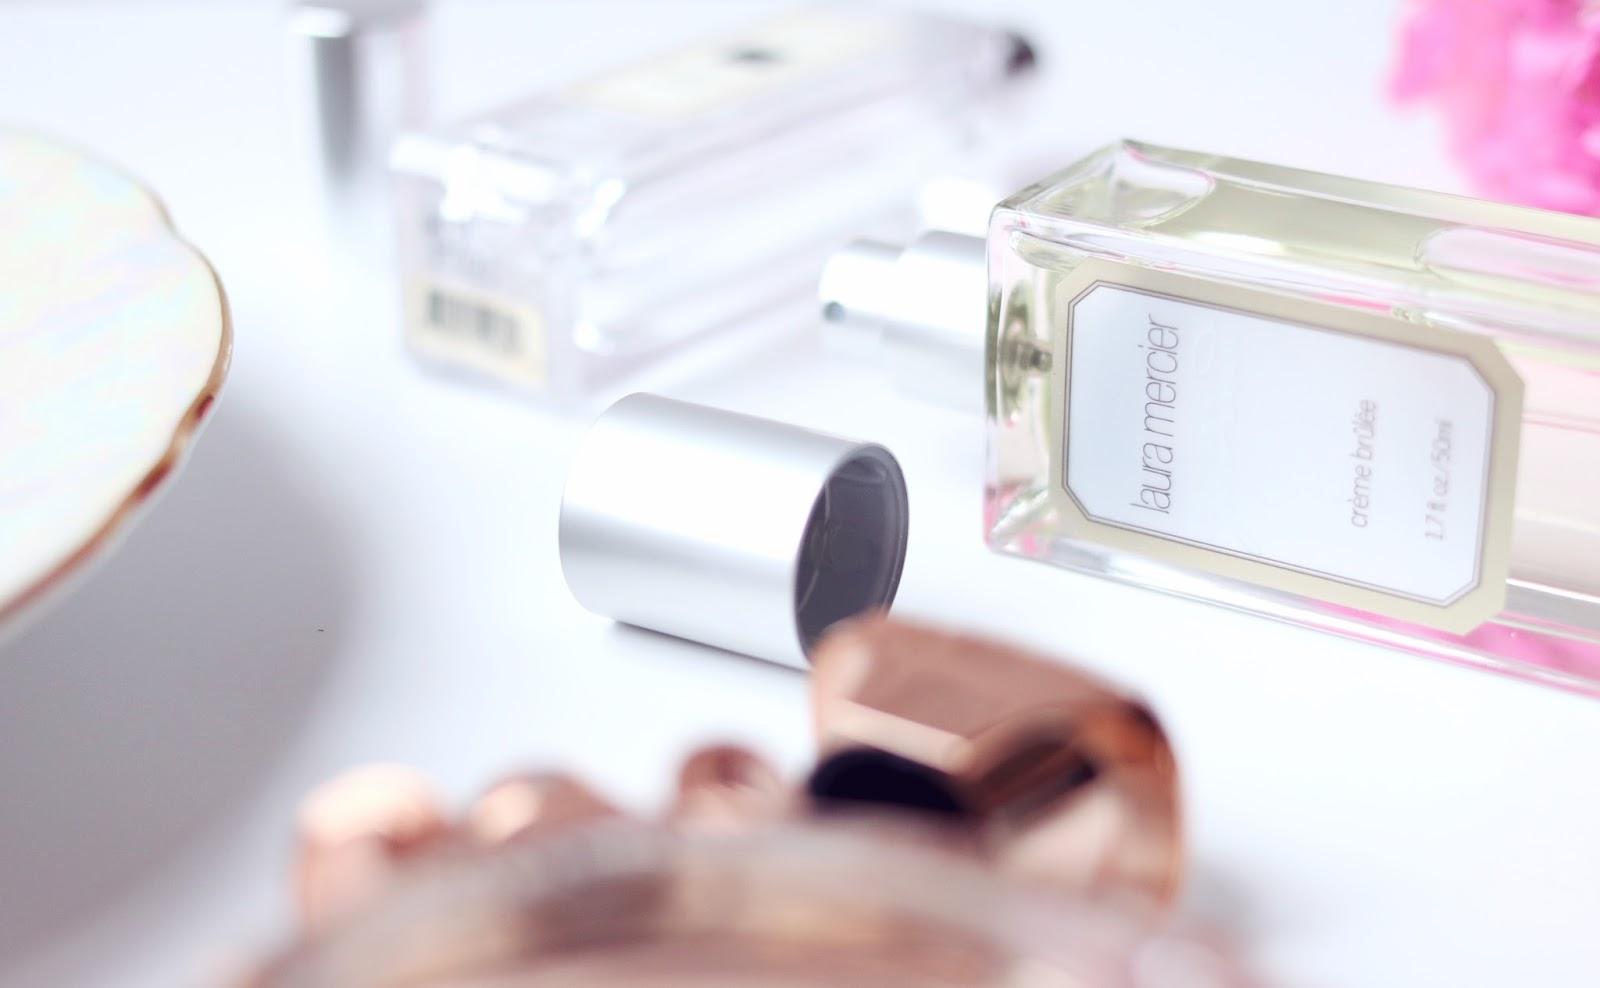 Laura Mercier Creme Brûlée Fragrance